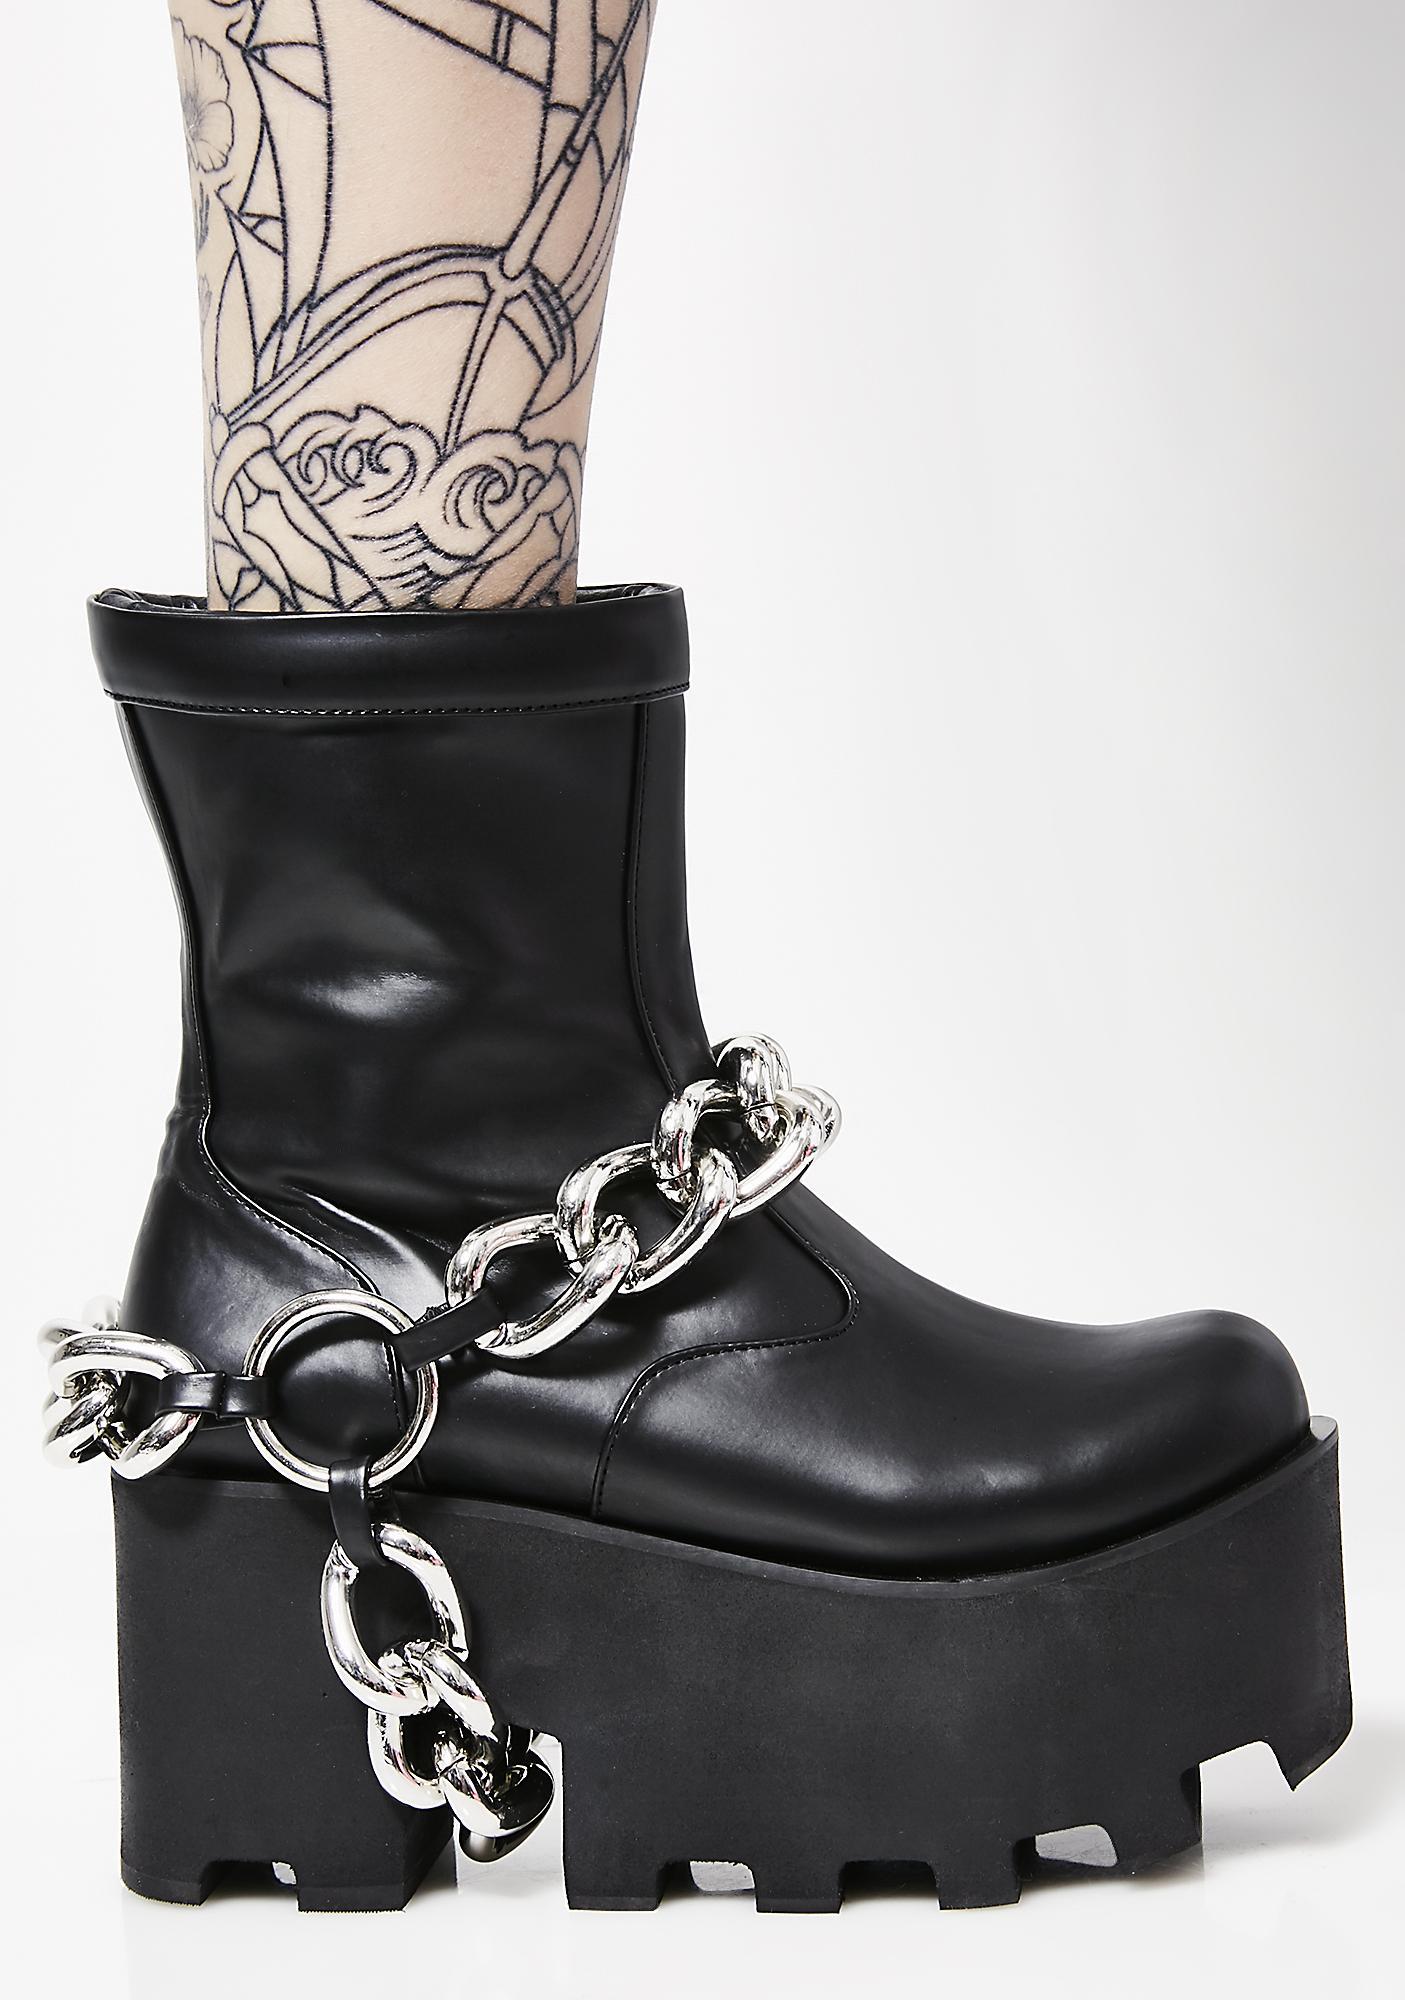 Charla Tedrick G-Train Boots